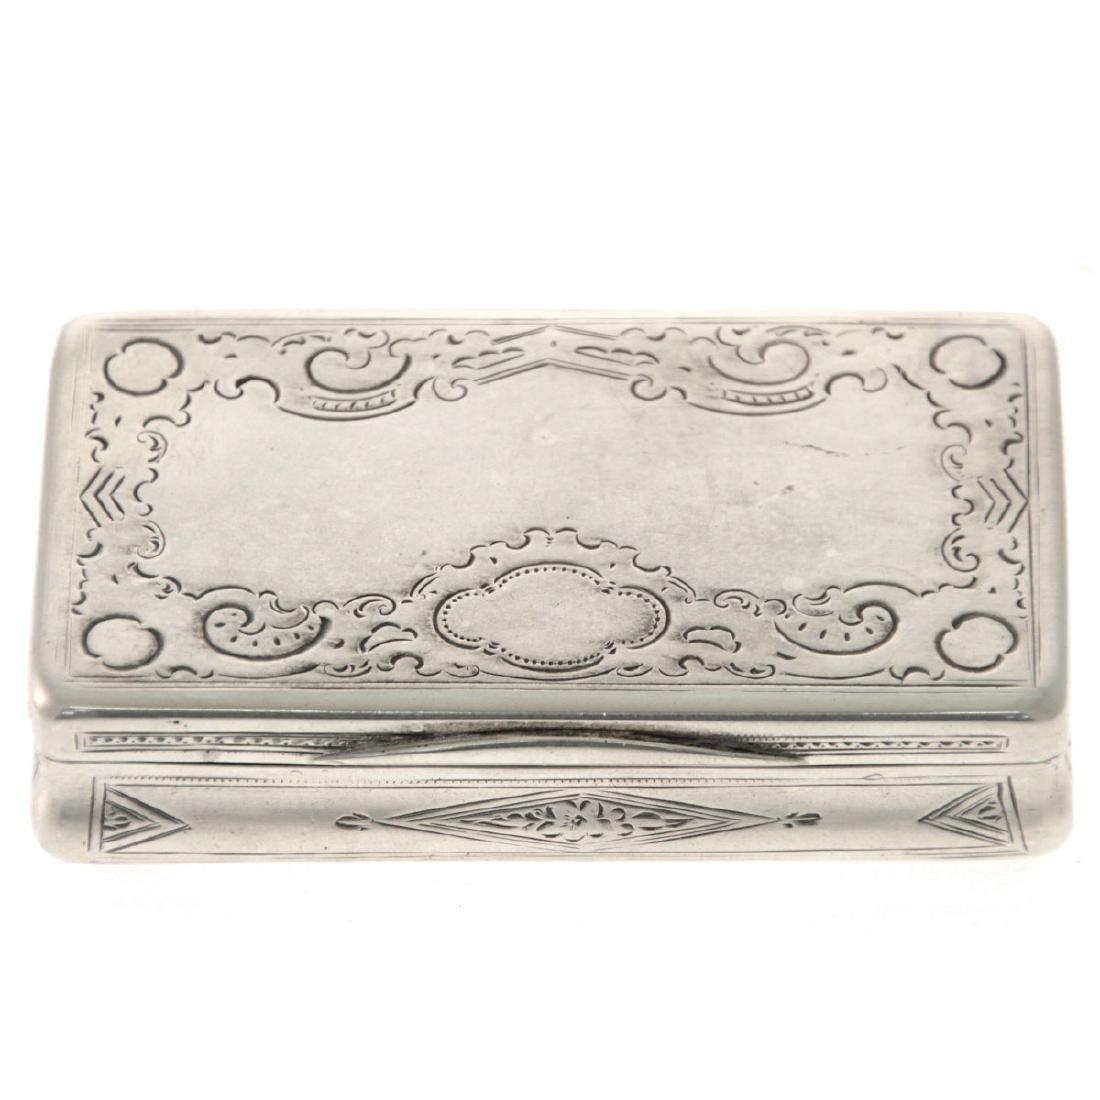 Antique Silver Snuff Box, Vienna, Austria, 1868.